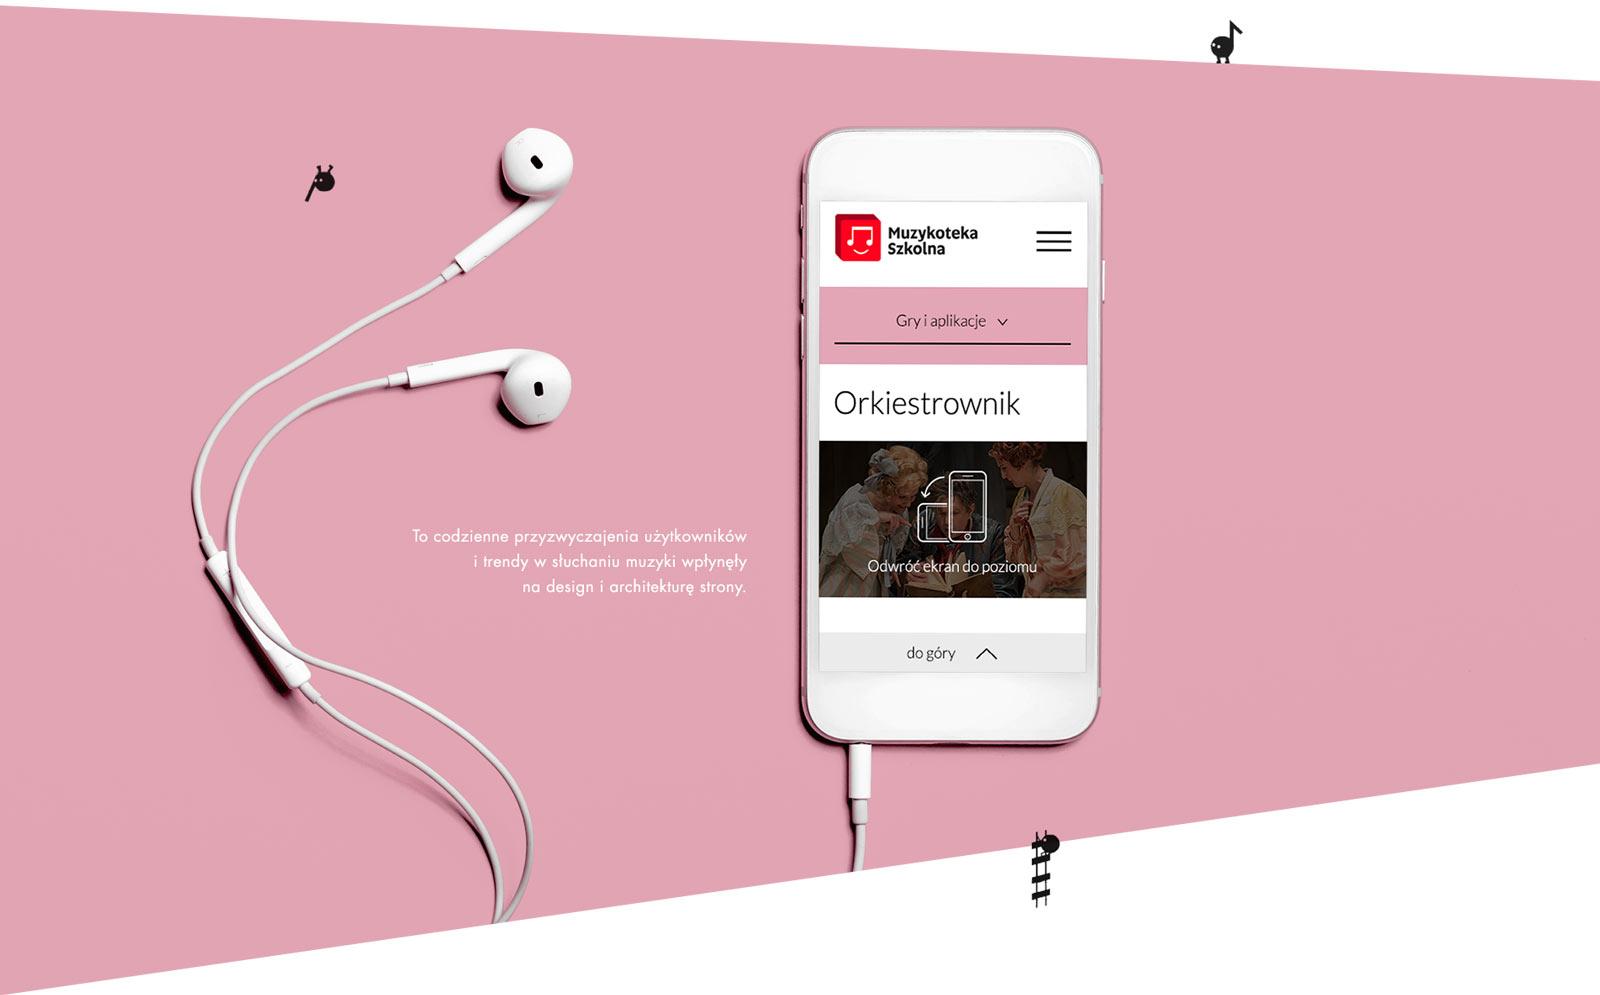 https://peppermint.pl/wp-content/uploads/2018/09/iphone.jpg